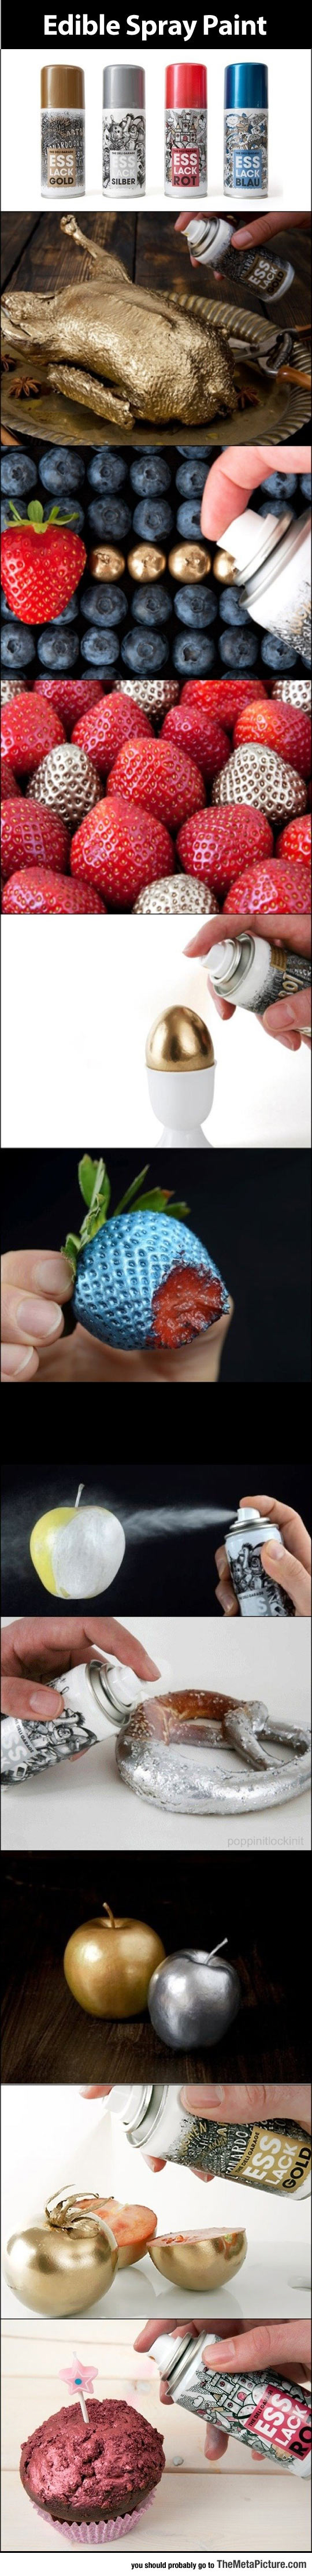 funny-edible-spray-paint-food